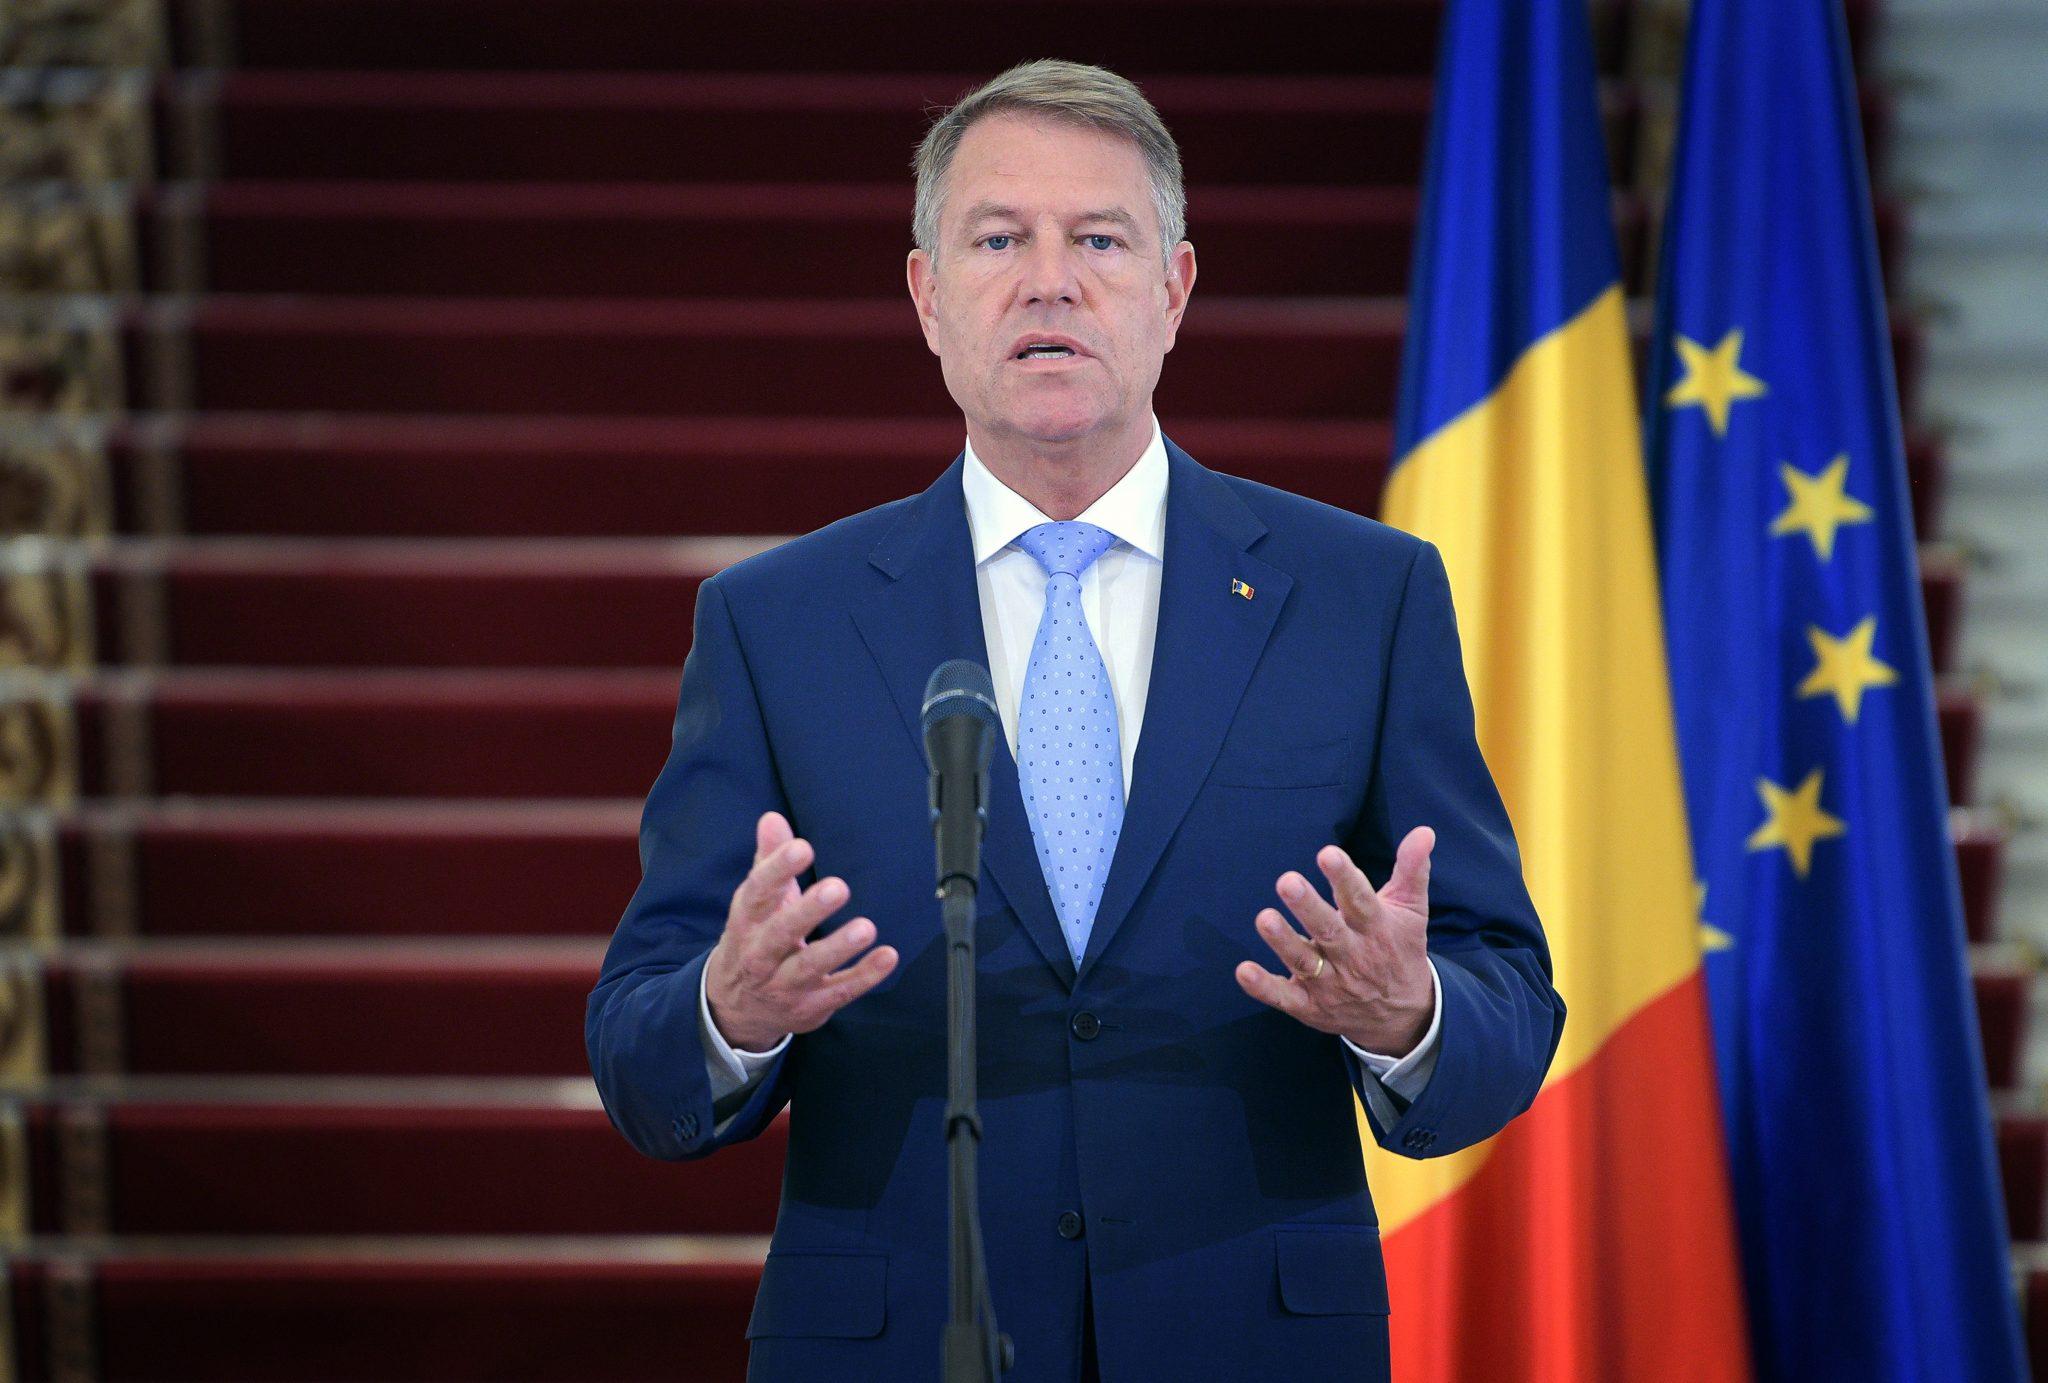 Romania President Iohannis Harshly Attacks Szeklerland Autonomy Plans Causing Diplomatic Tension post's picture